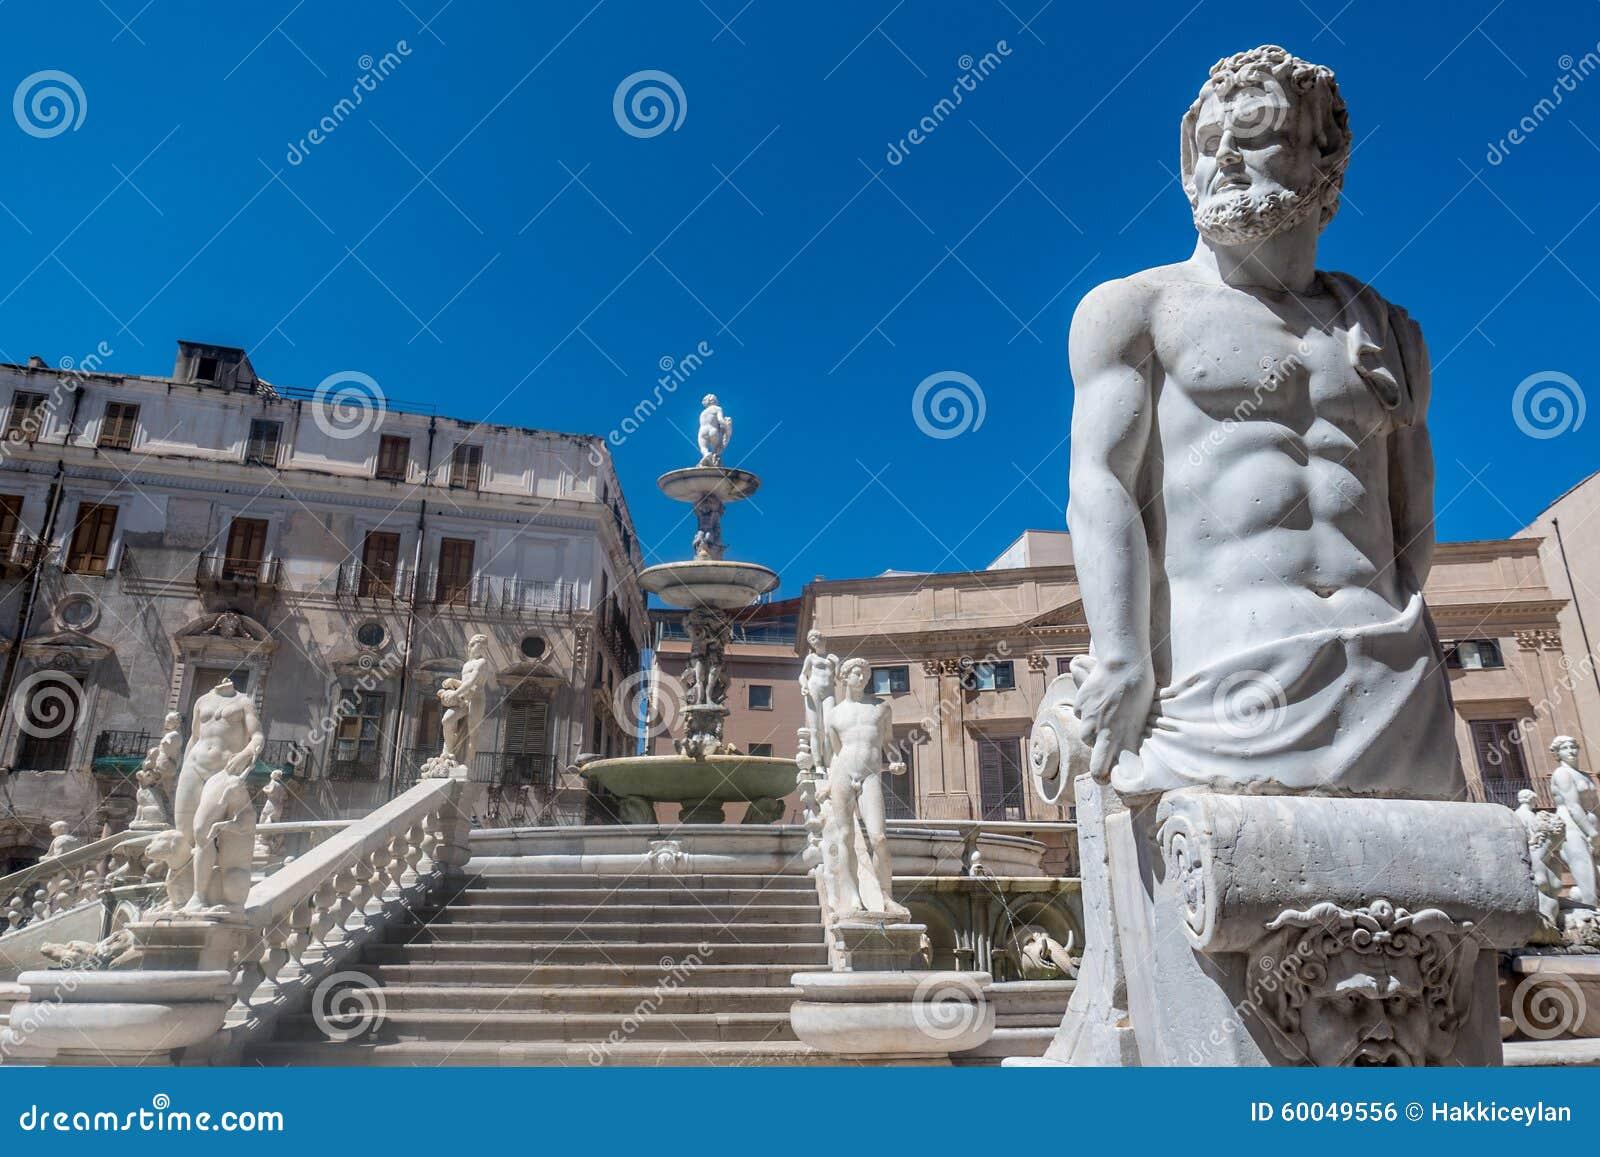 Marmorstatuen auf Treppenhaus, Palermo, Italien